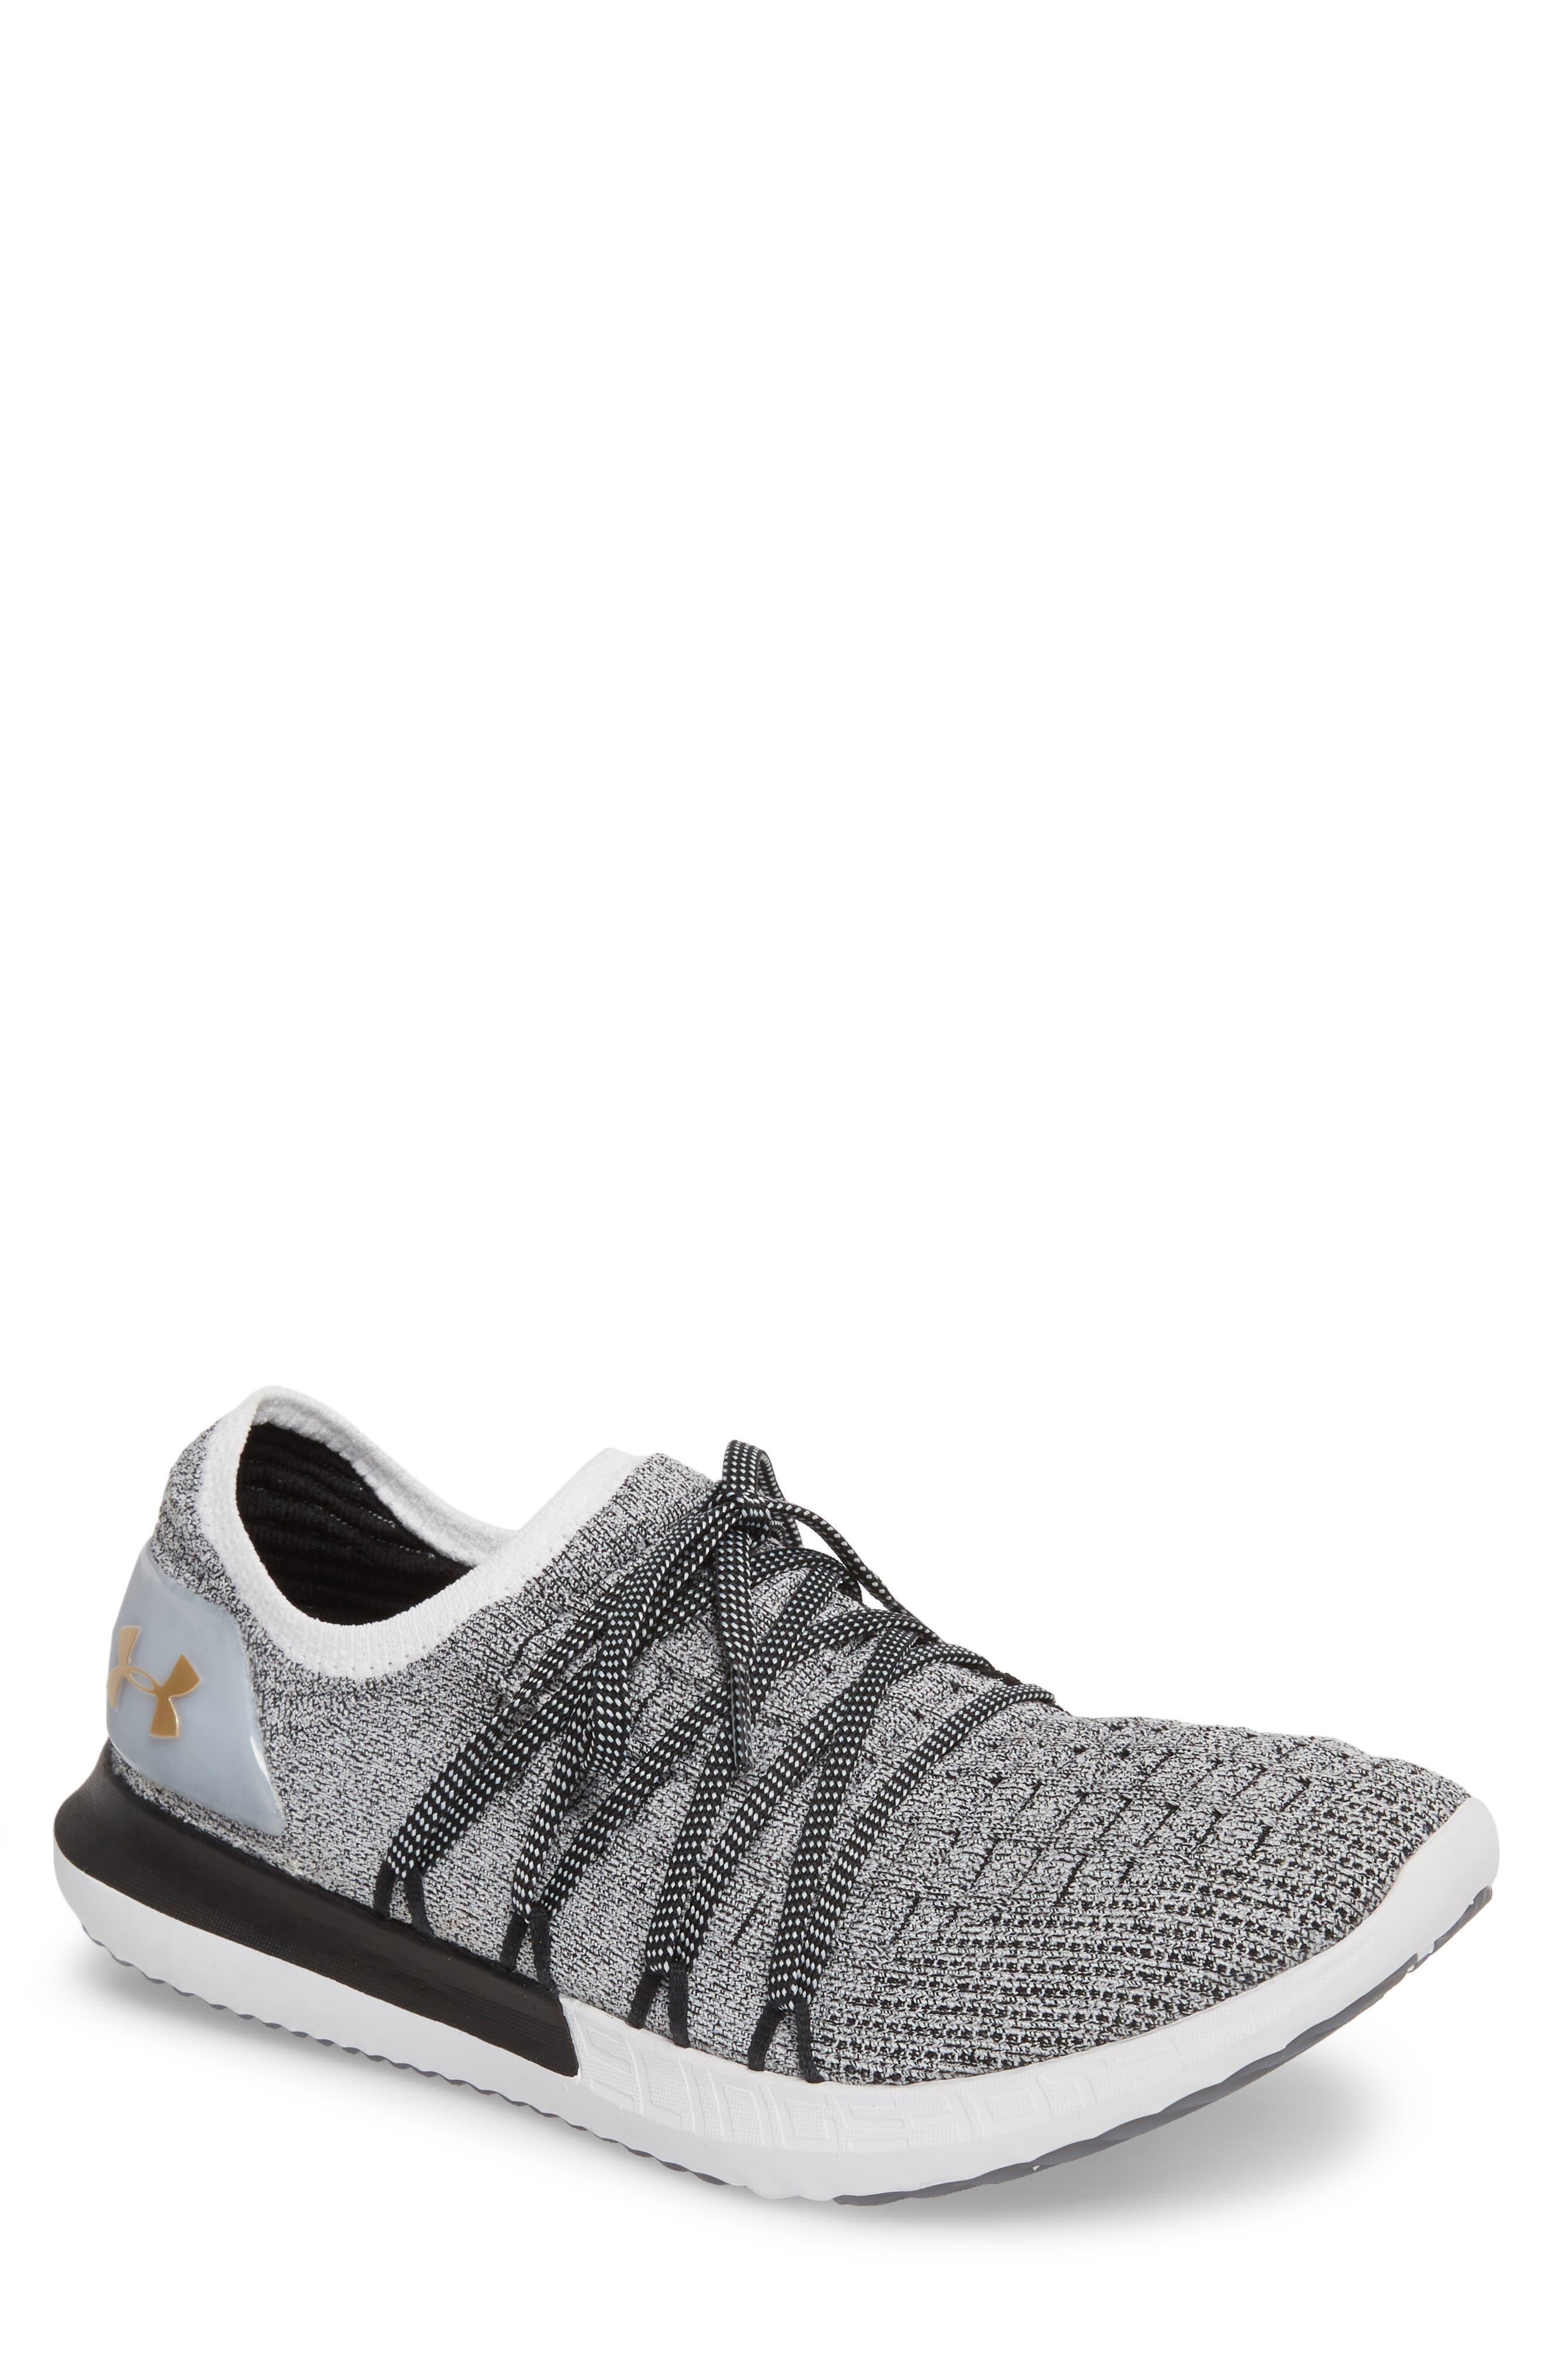 Speedform<sup>®</sup> Slingshot 2 Sneaker,                             Main thumbnail 1, color,                             White / Black / Metallic Gold